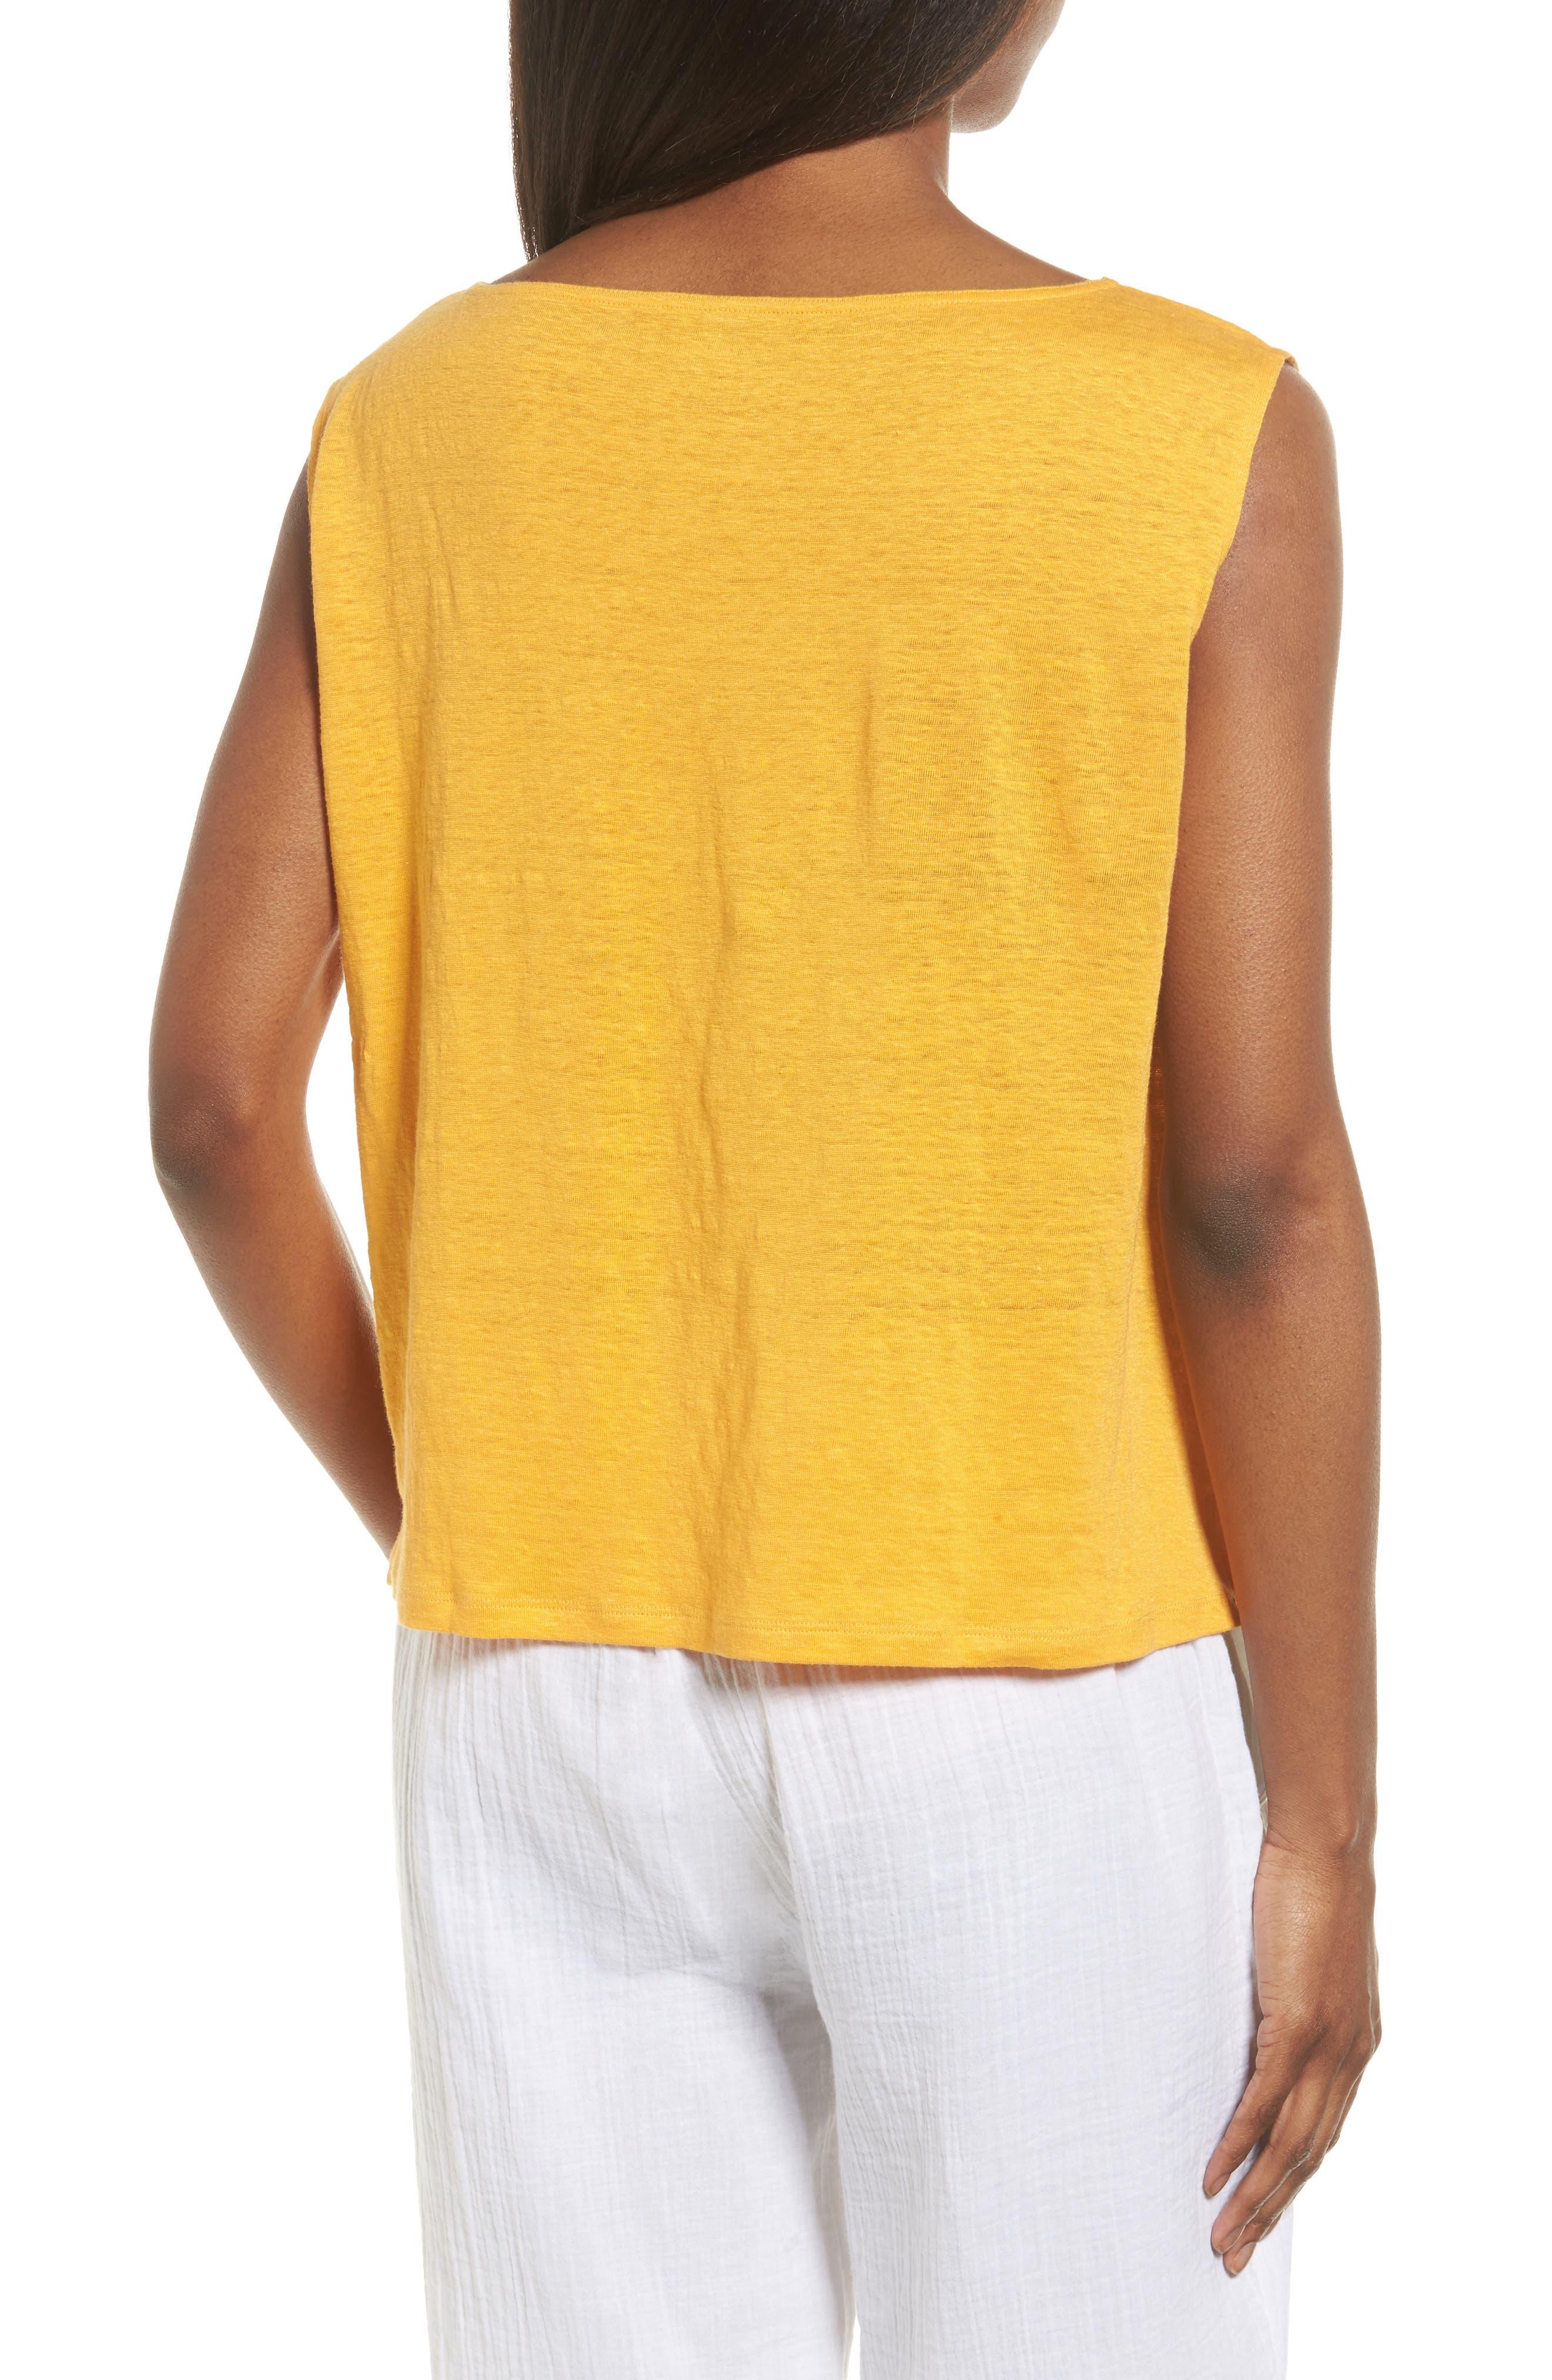 Organic Linen Top,                             Alternate thumbnail 2, color,                             Orangeade